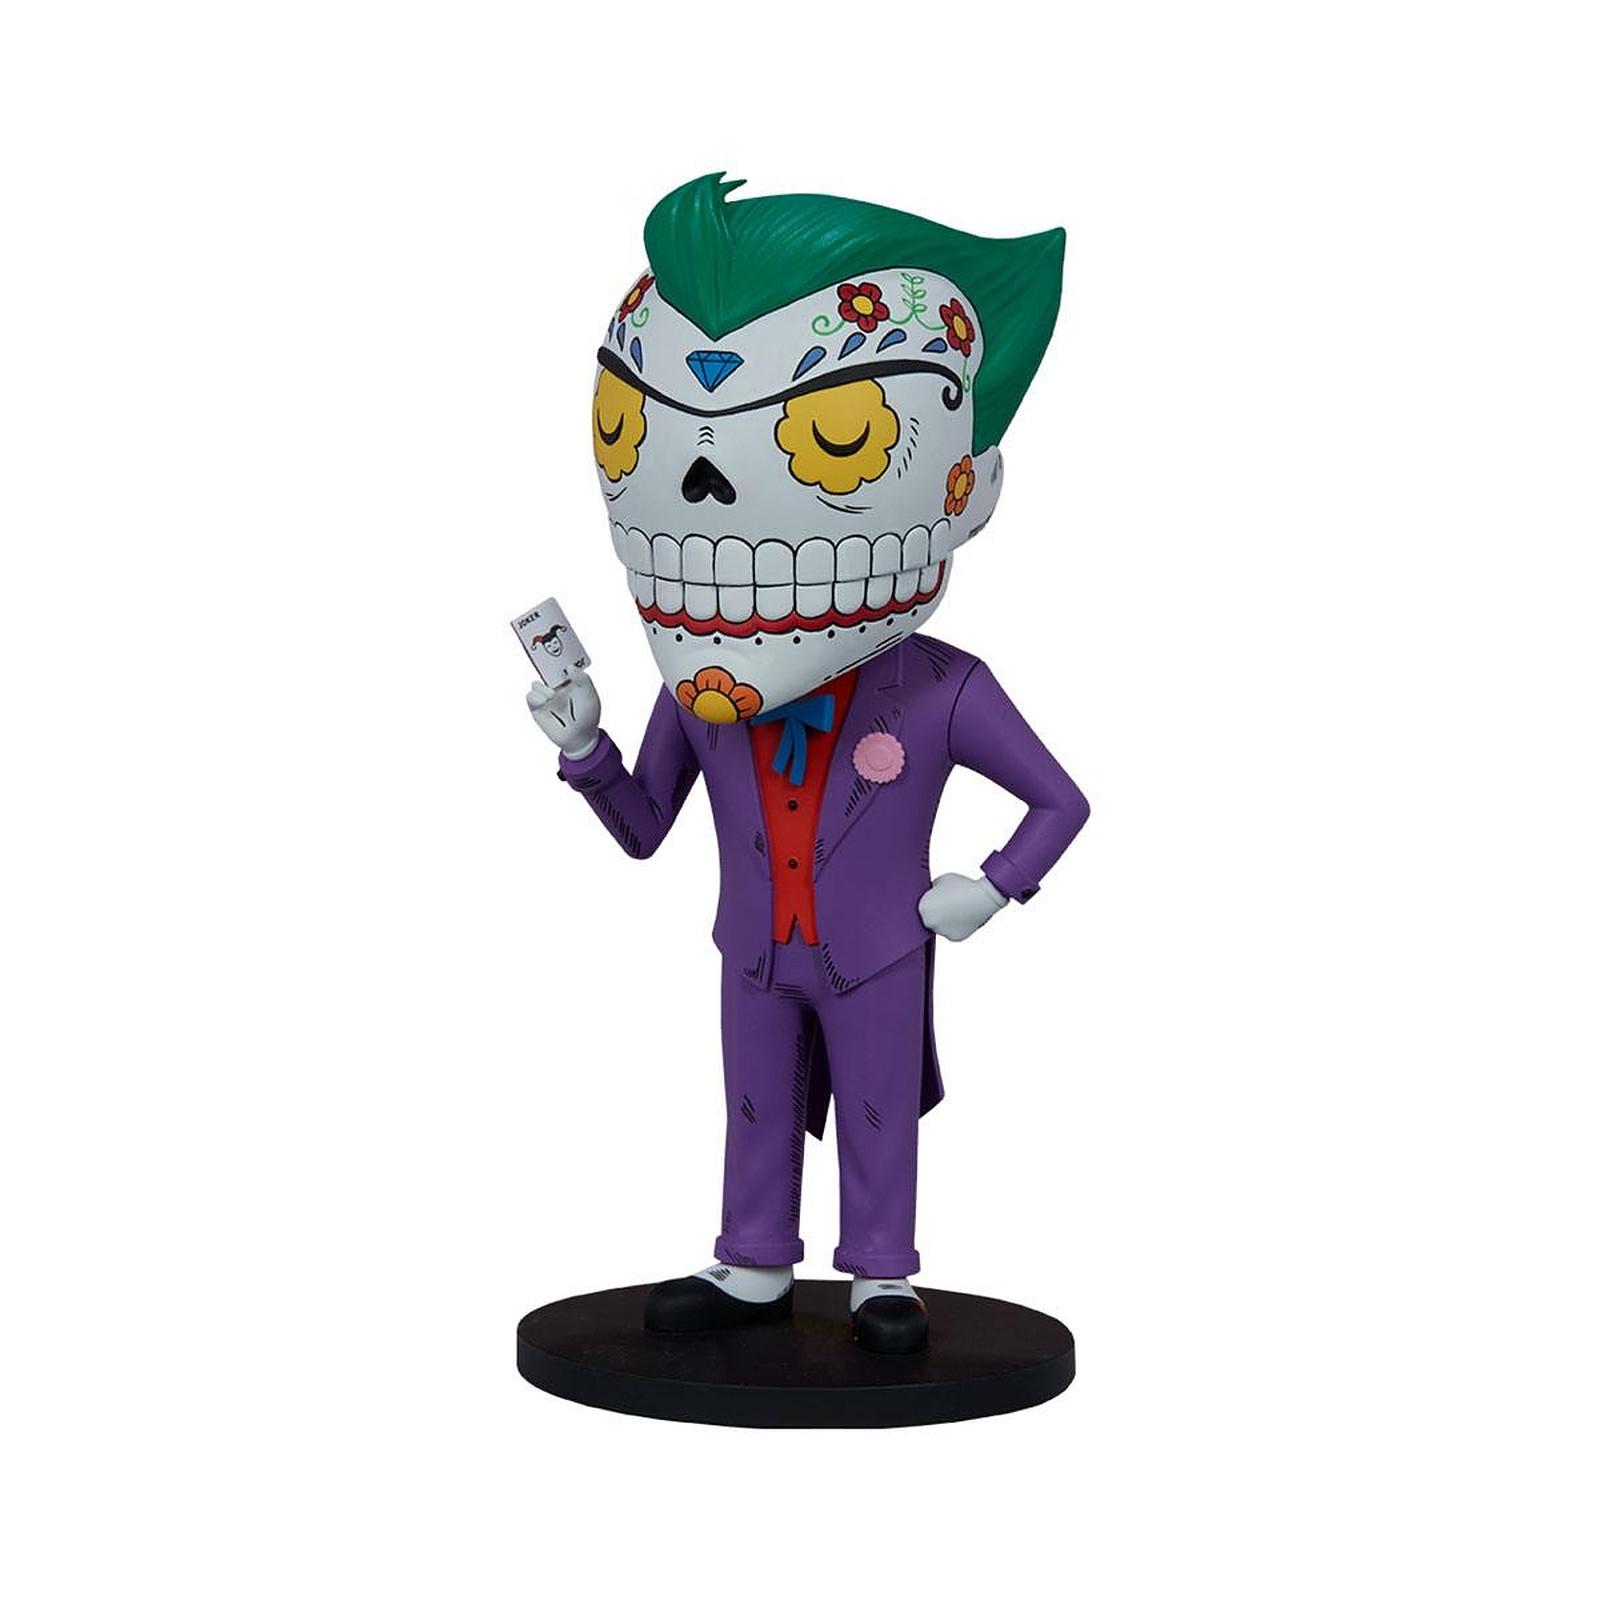 DC Comics - Statuette The Joker Calavera 20 cm